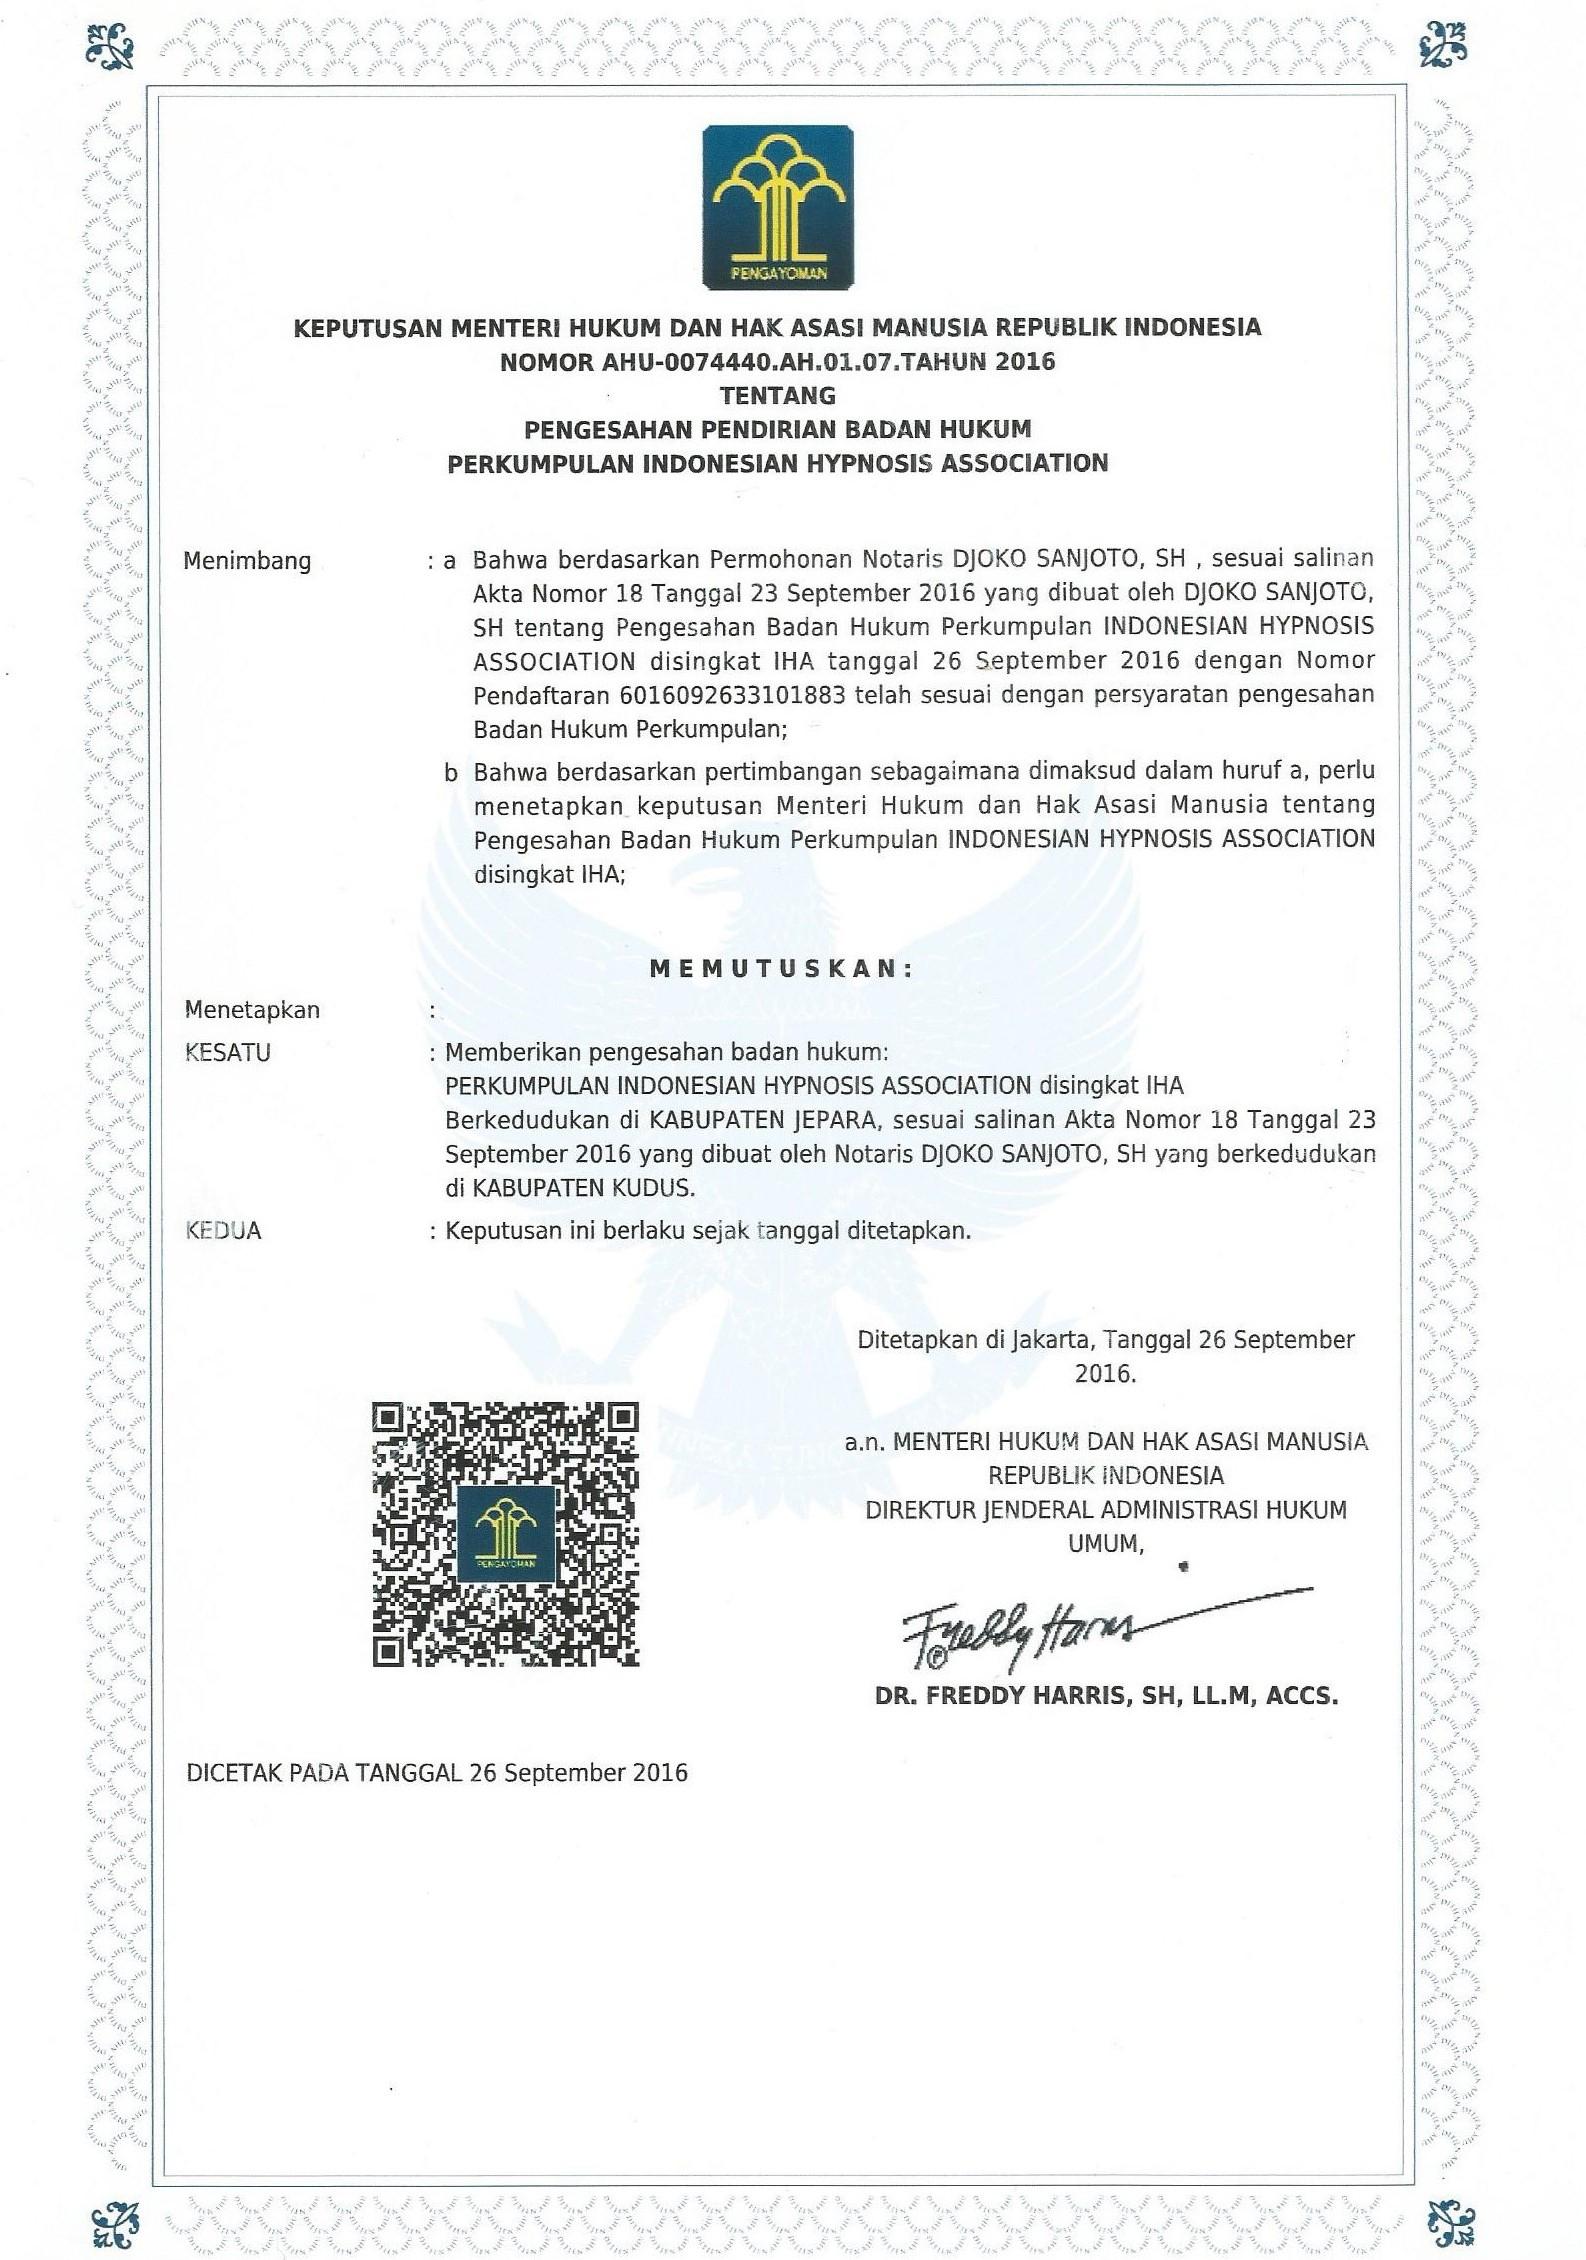 Pelatihan Hipnoterapi Bersertifikat Resmi